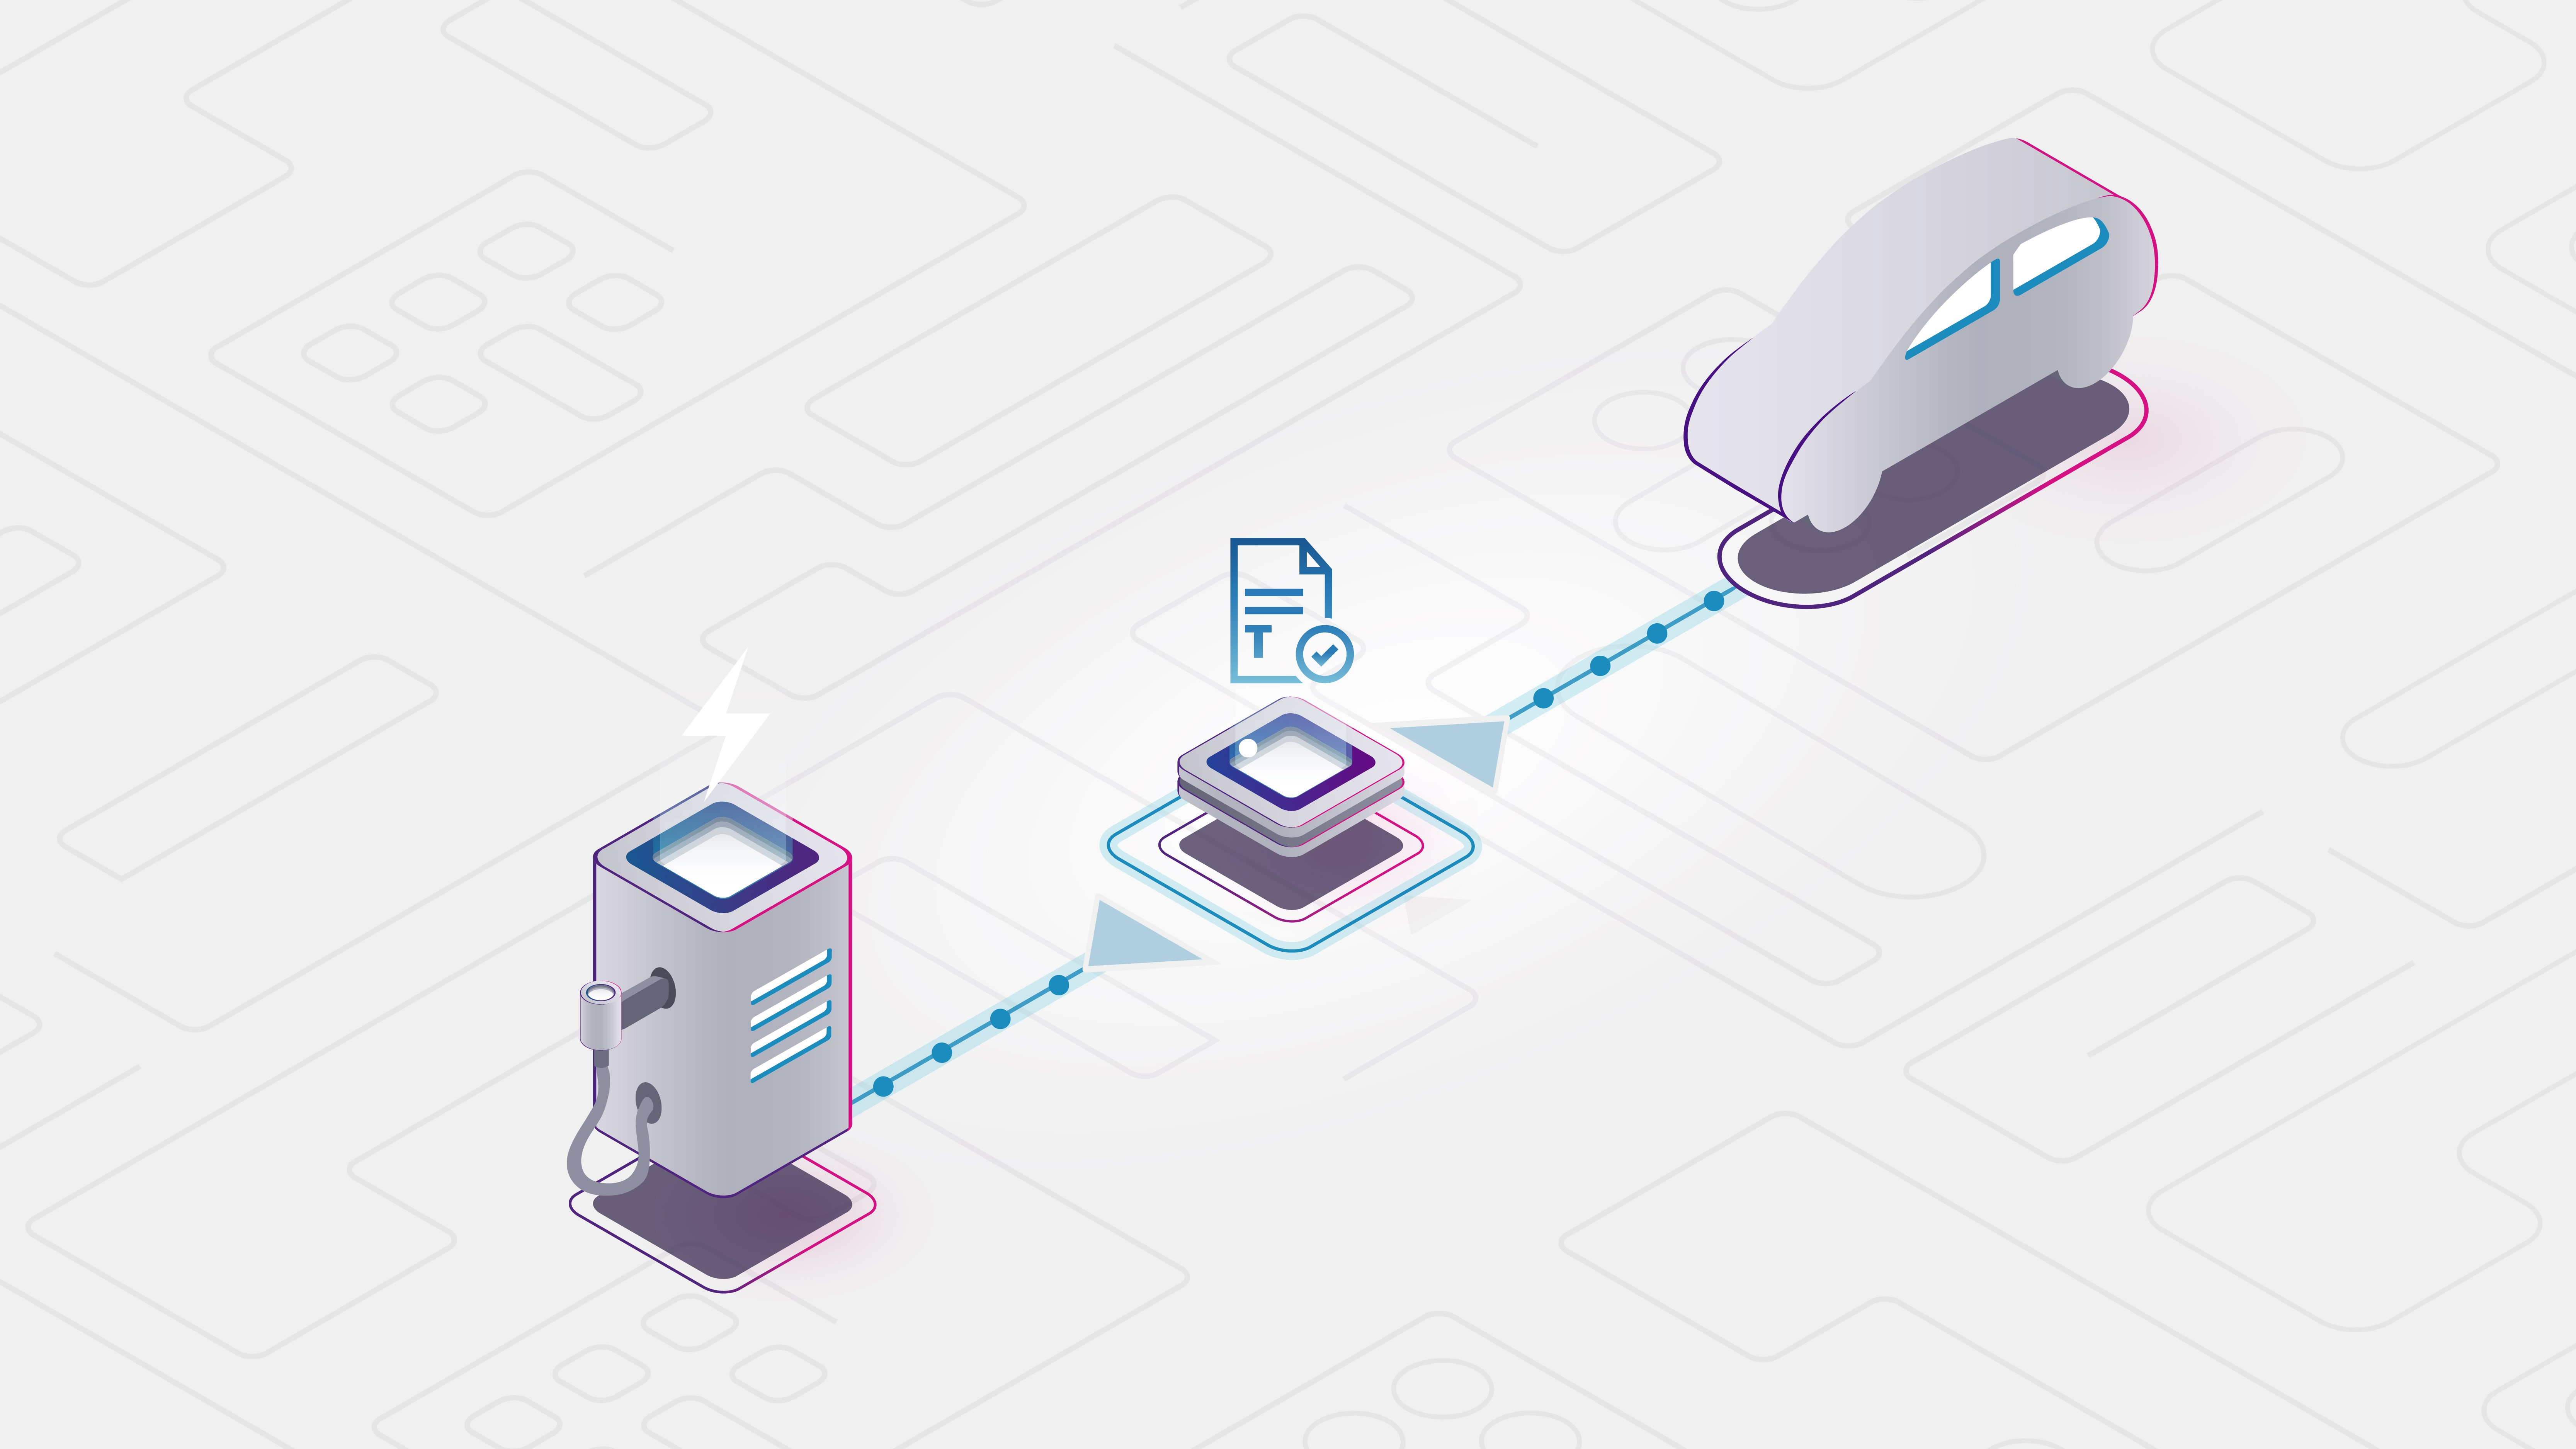 Distributed Ledger Technology (DLT) herstelt vertrouwen in het internet